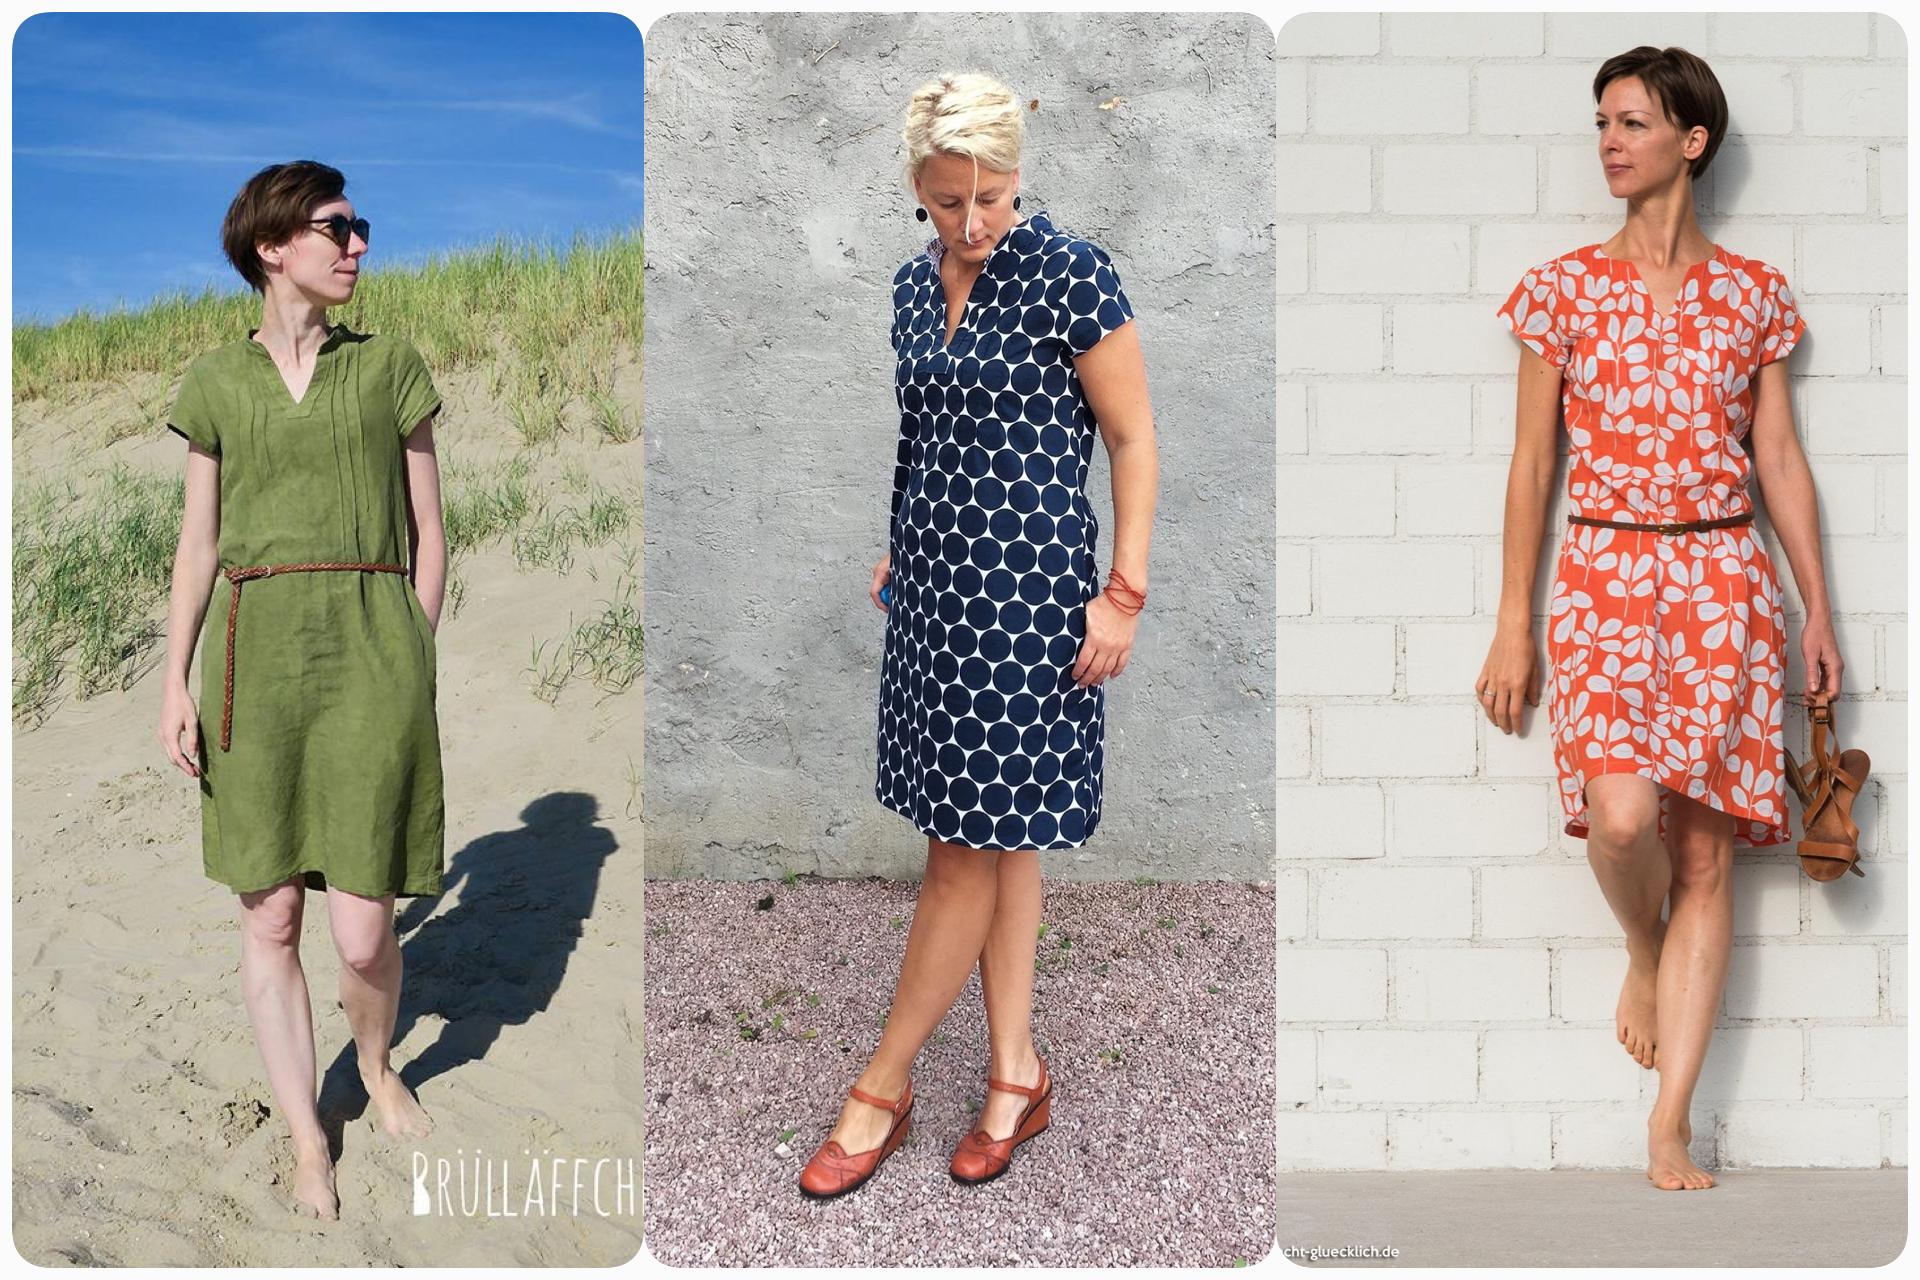 finaskleid | kleid mit ärmel, modestil, kleider